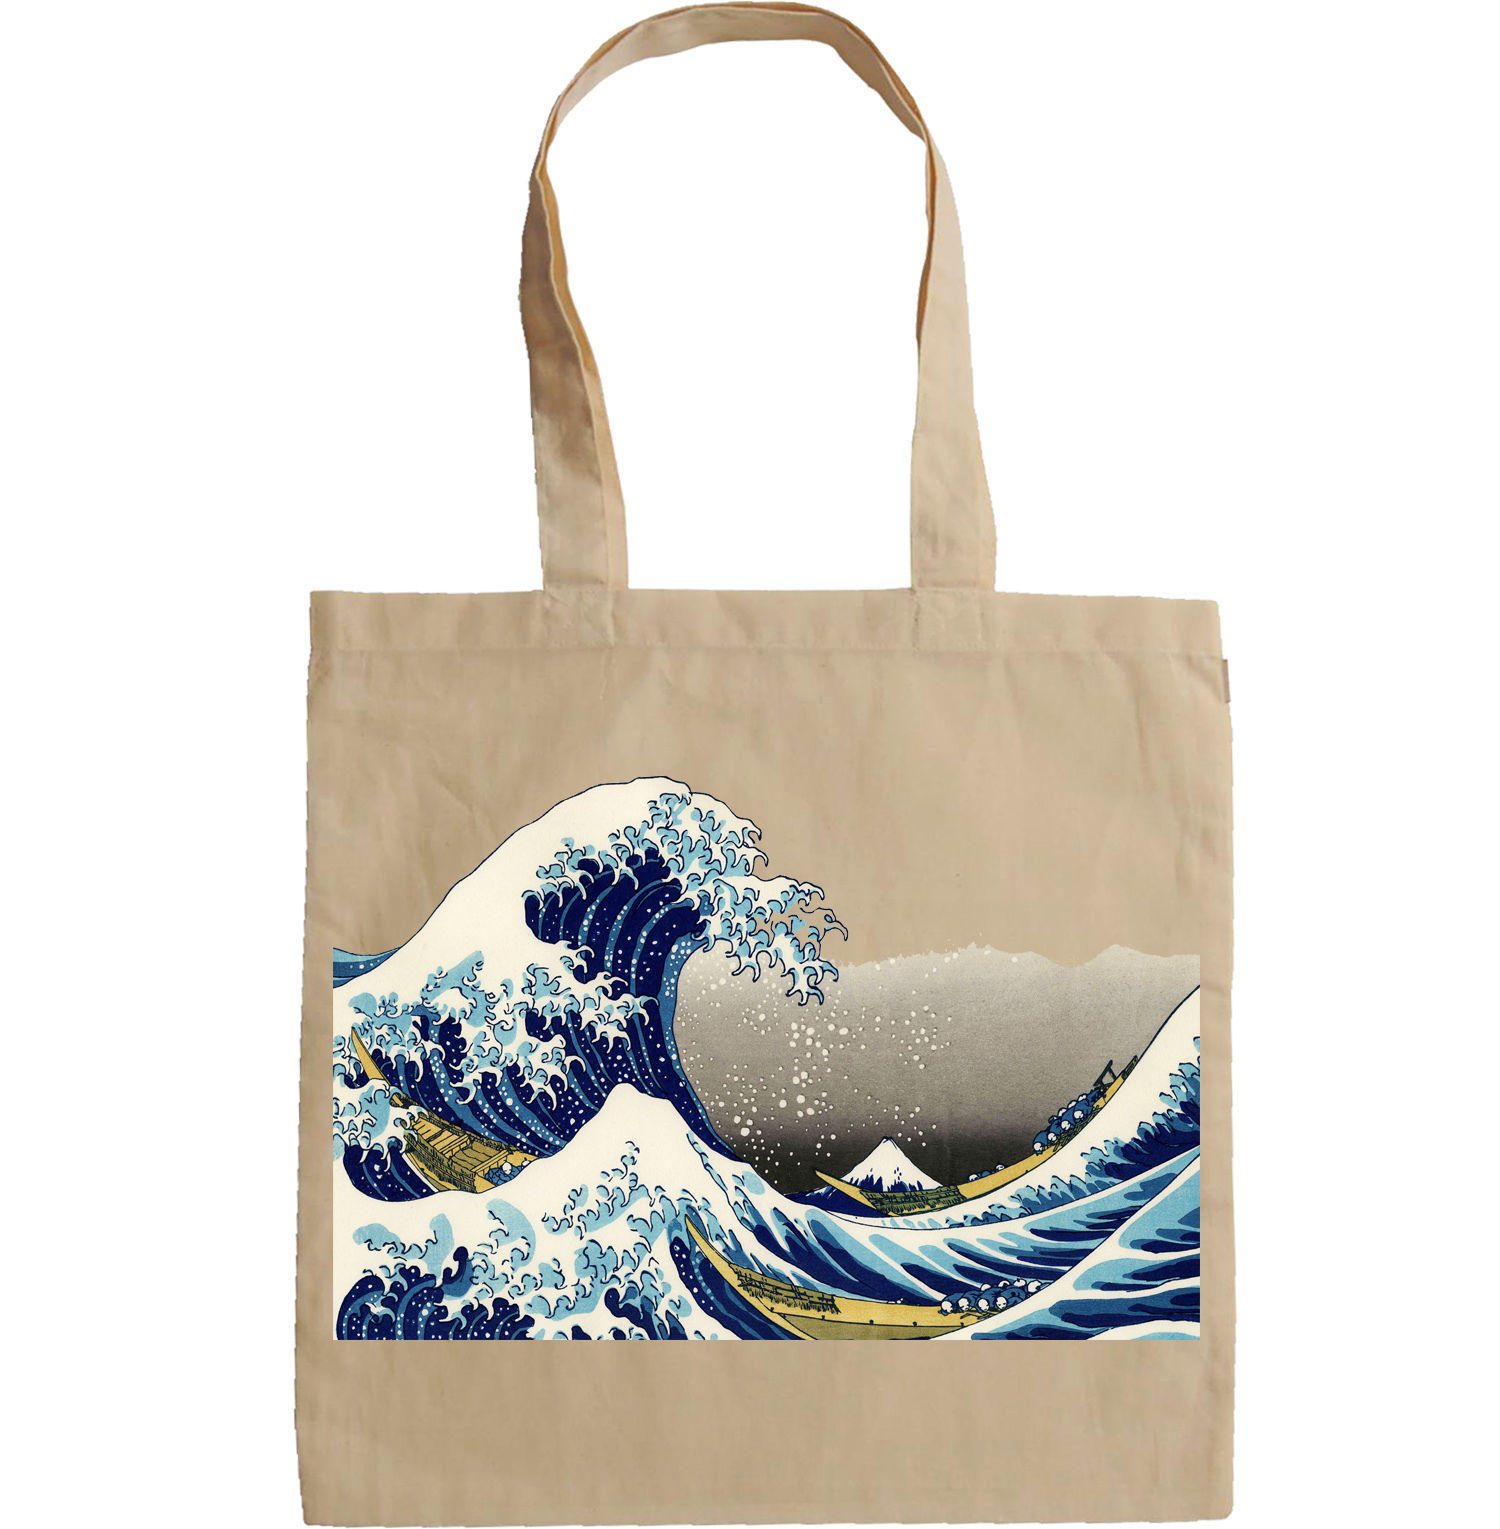 THE GREAT WAVE OFF KANAGAWA - NEW AMAZING GRAPHIC HAND BAG/TOTE BAG